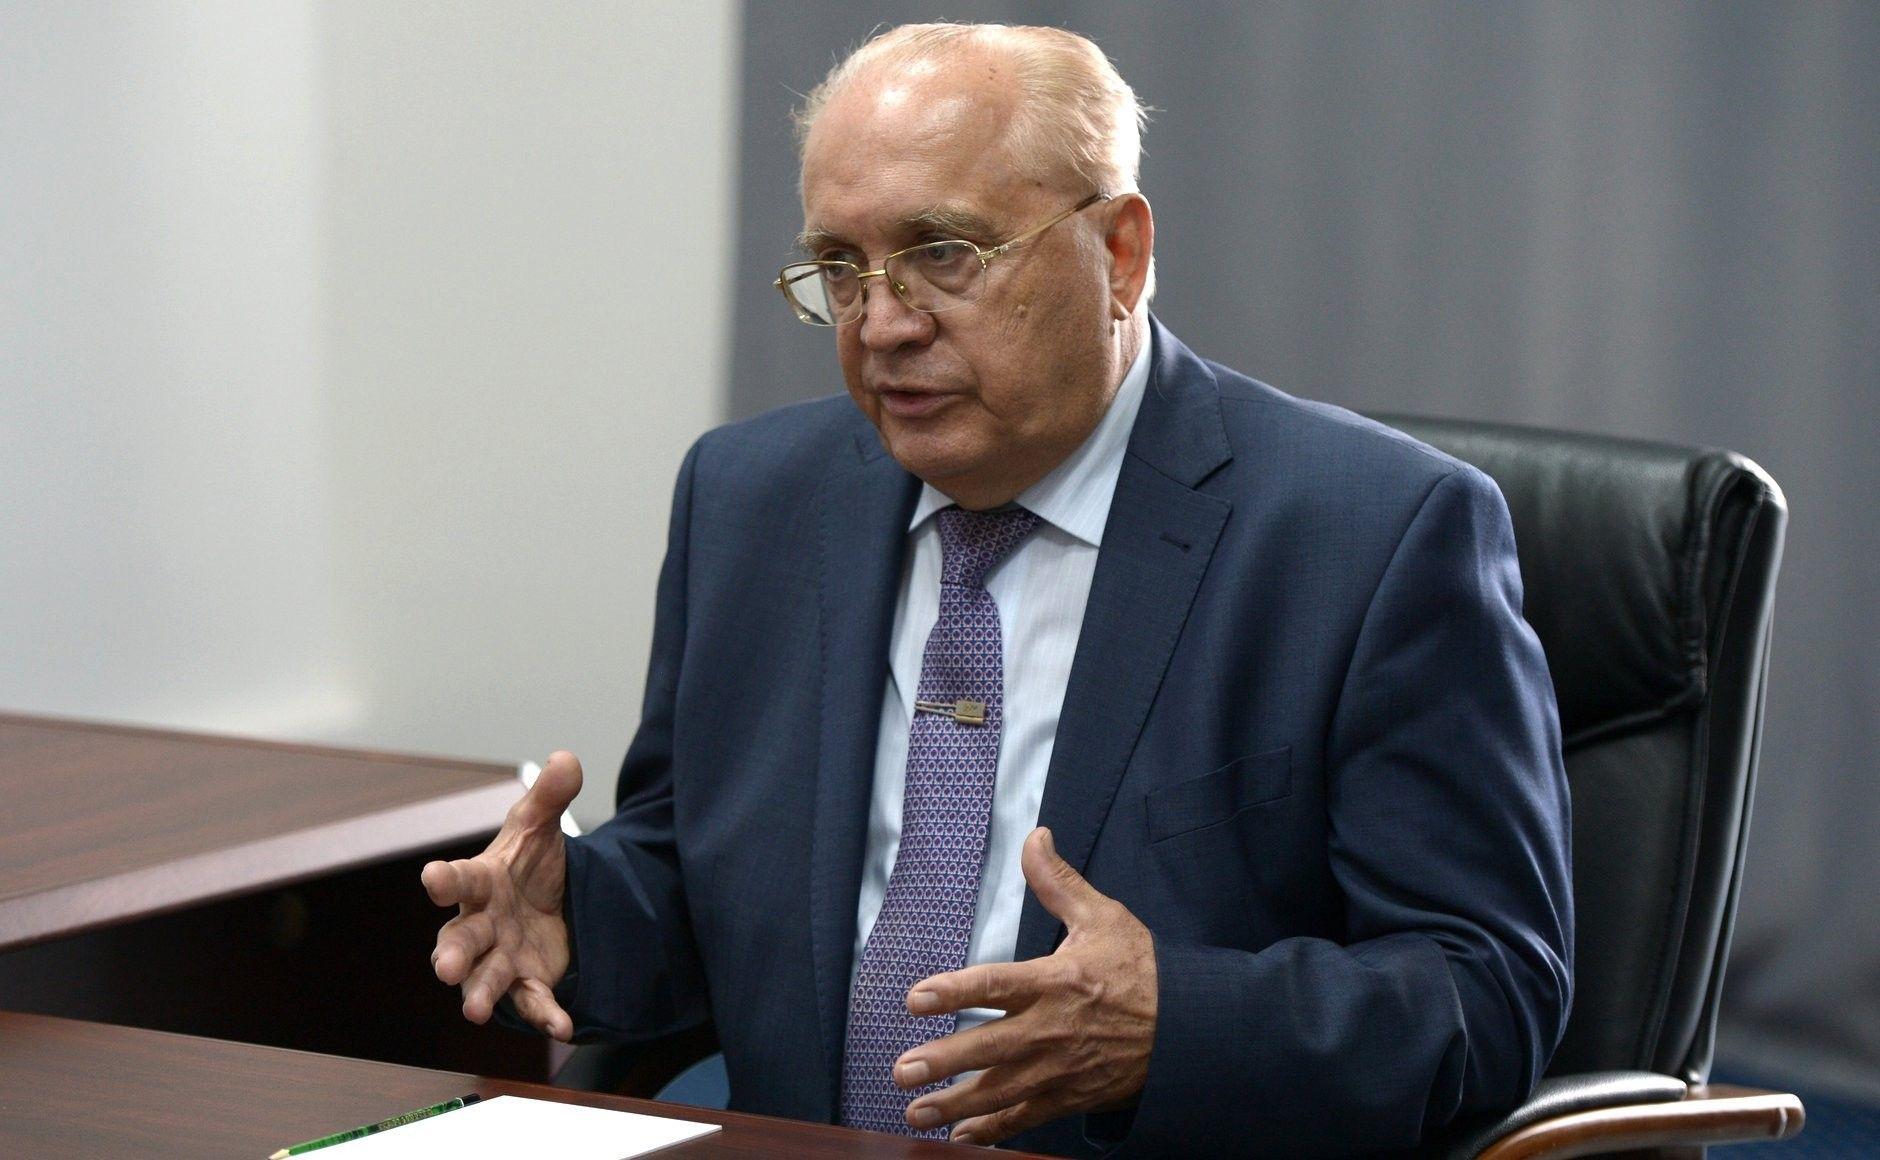 доктор физико-математических наук (с1974 года), профессор мехмата МГУ (с1975 года), ректор МГУ с1992 года.